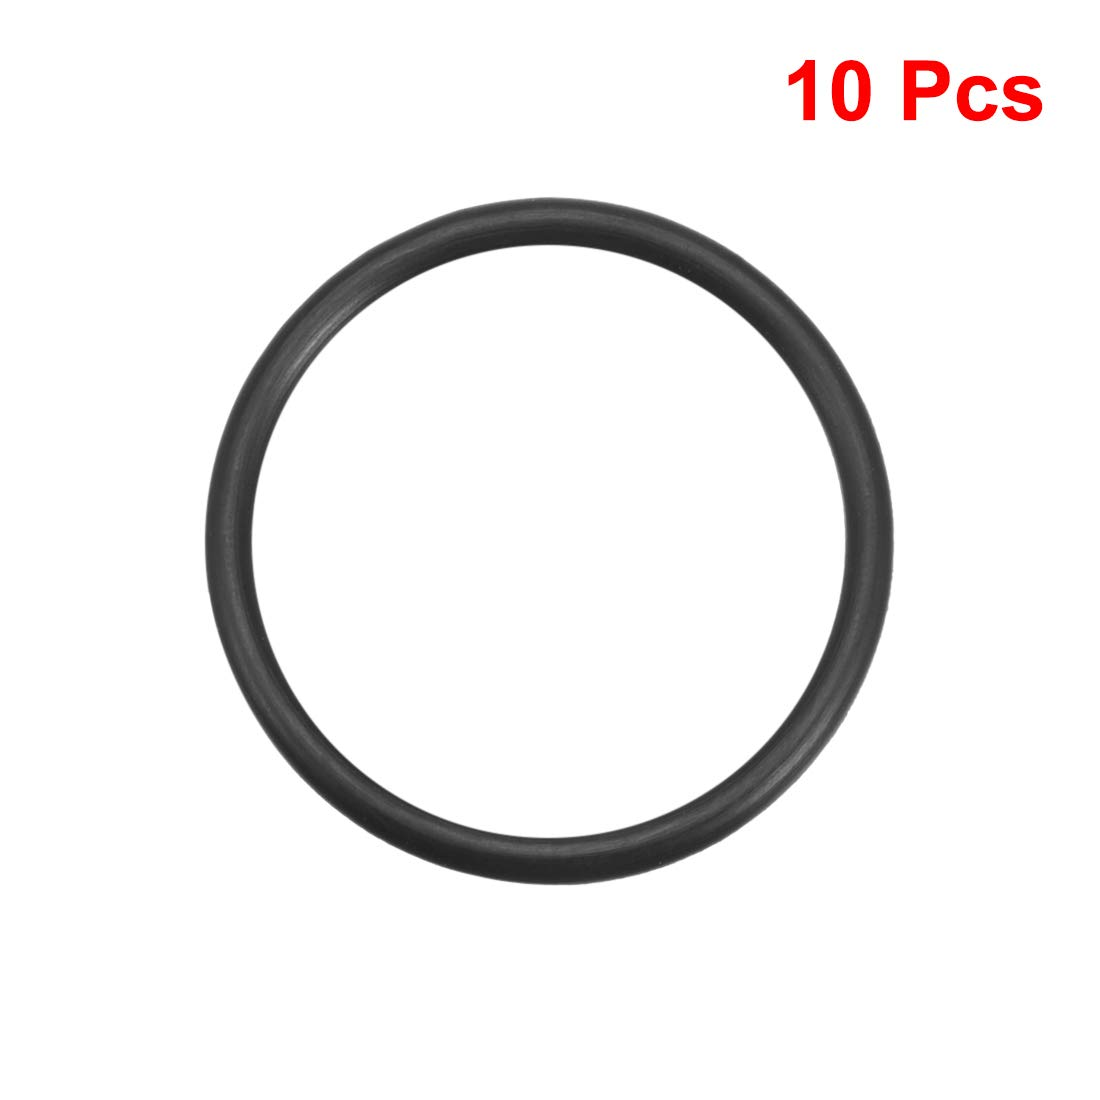 Sourcingmap juntas de sellado de anillos de goma de nitrilo de 40 mm a 75 mm de di/ámetro exterior de 3,1 mm de ancho